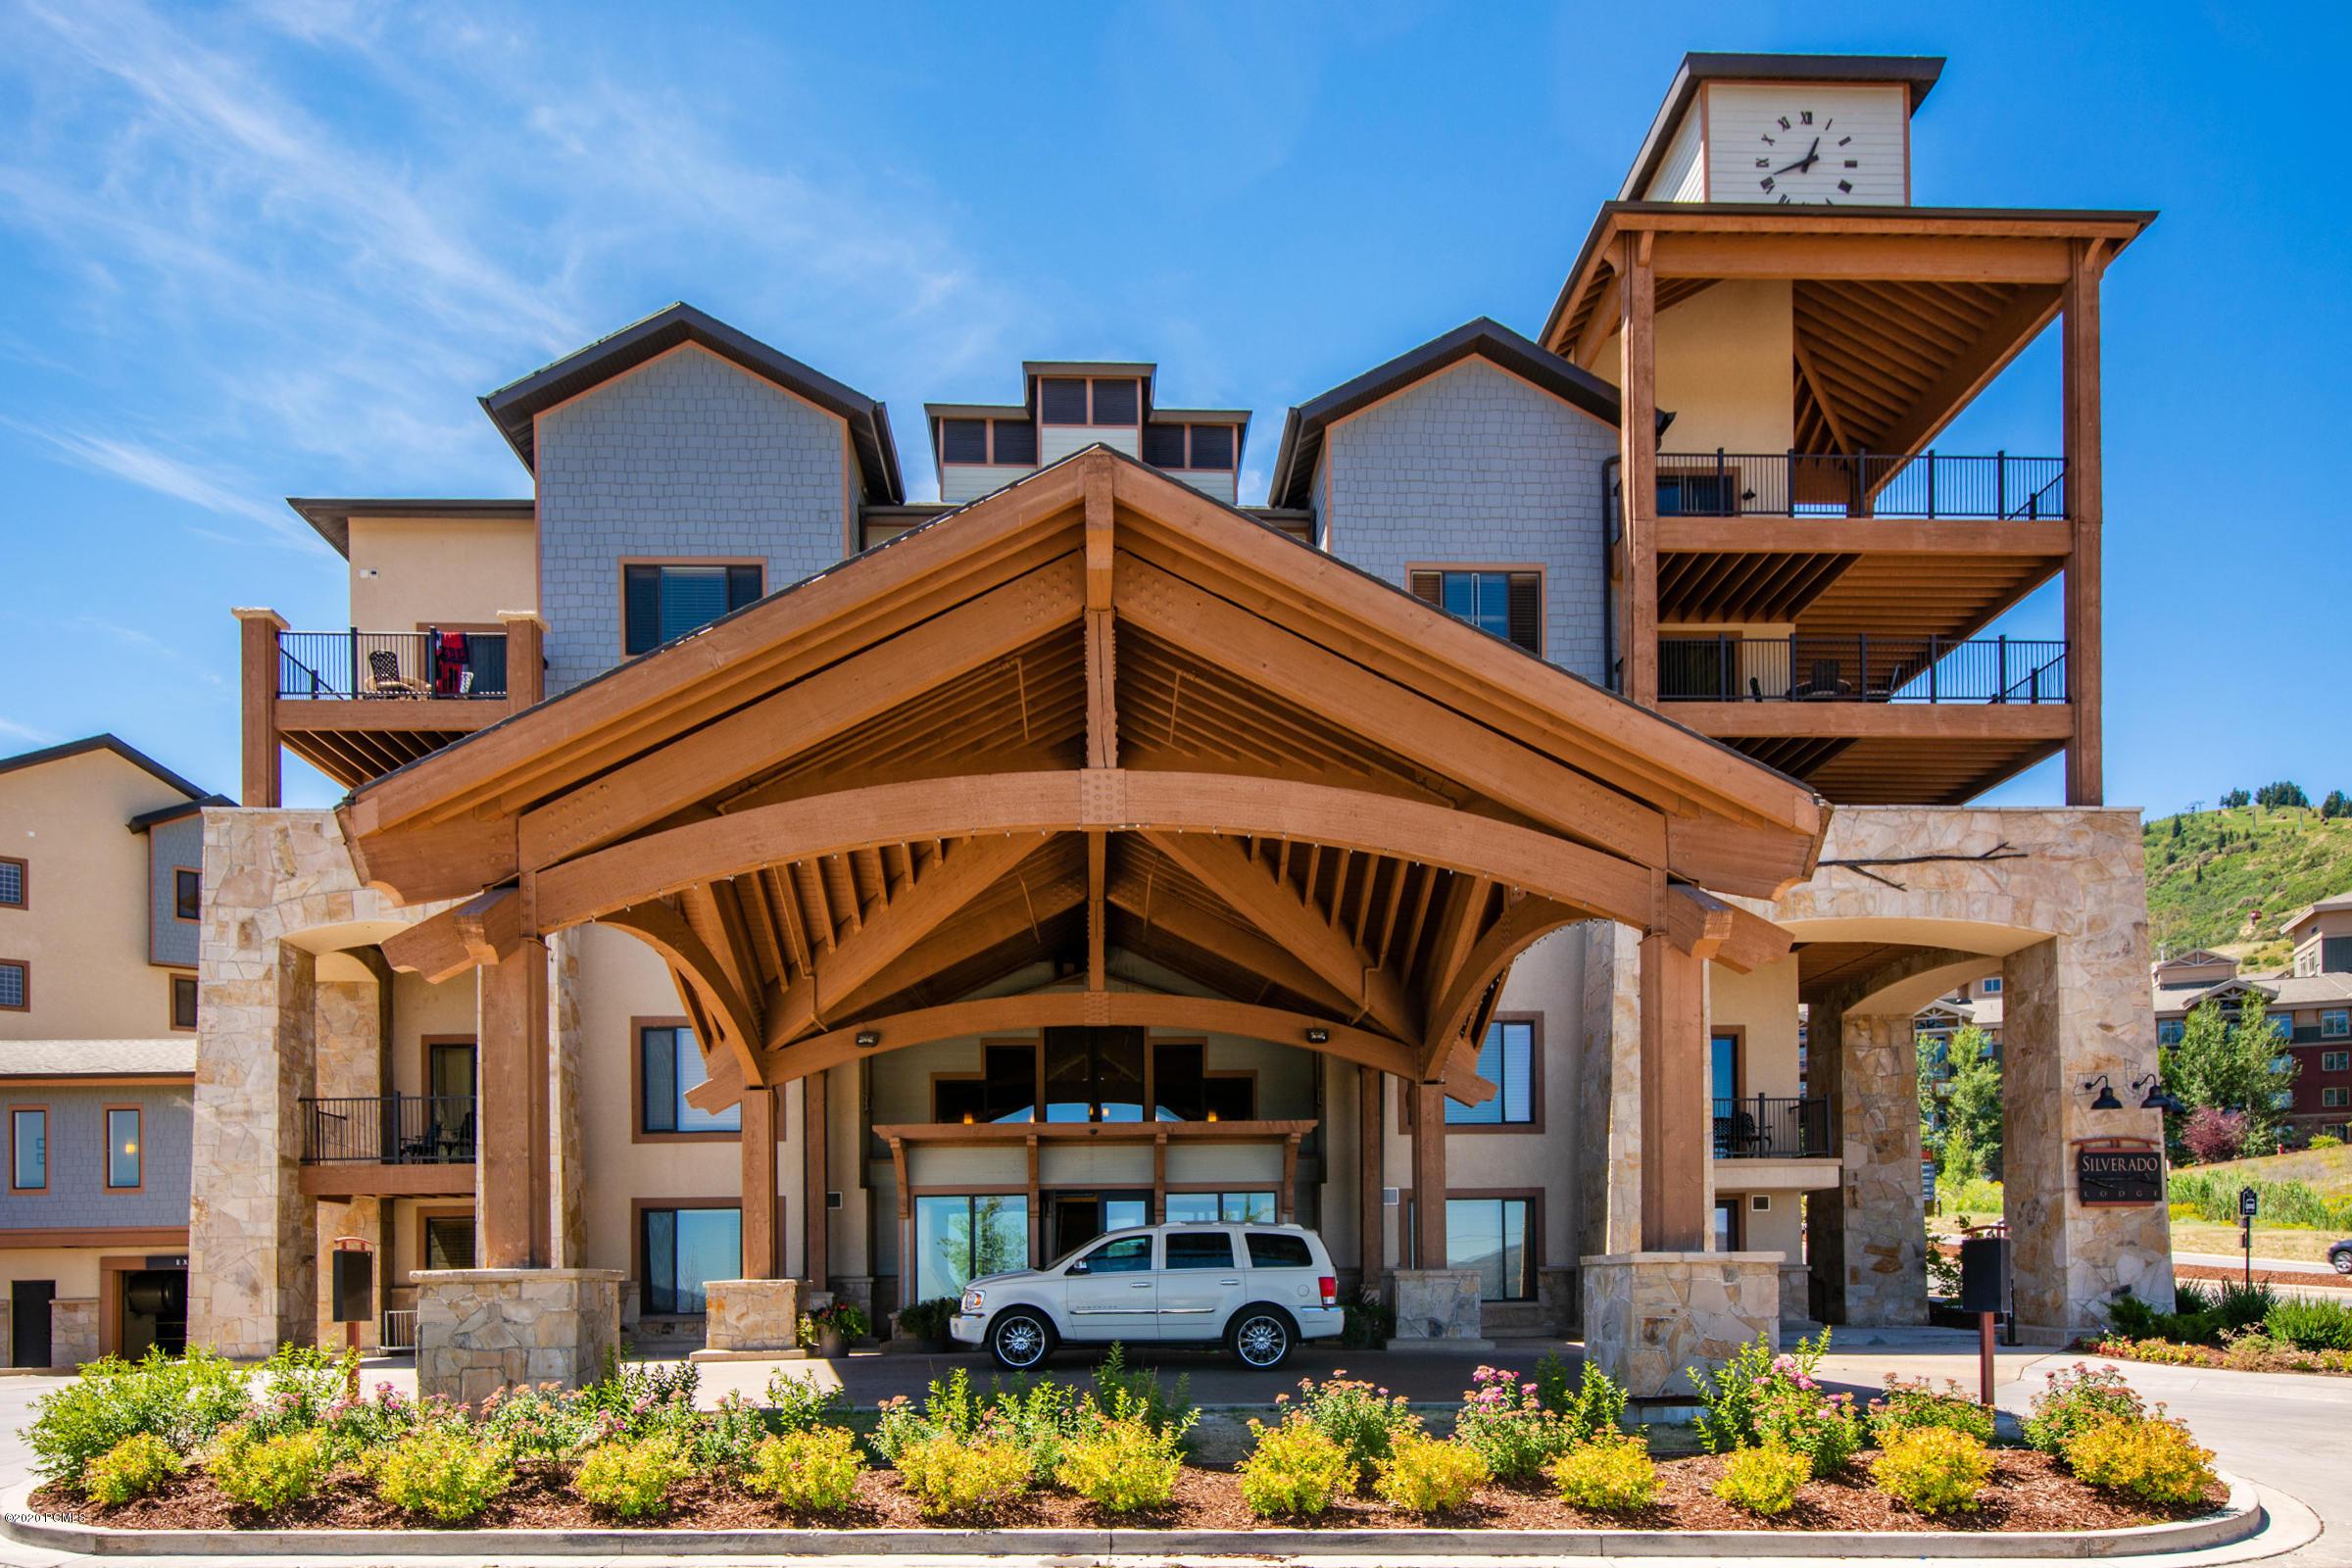 2653 Canyons Resort Drive, Park City, Utah 84098, 2 Bedrooms Bedrooms, ,3 BathroomsBathrooms,Condominium,For Sale,Canyons Resort,20190109112430415765000000